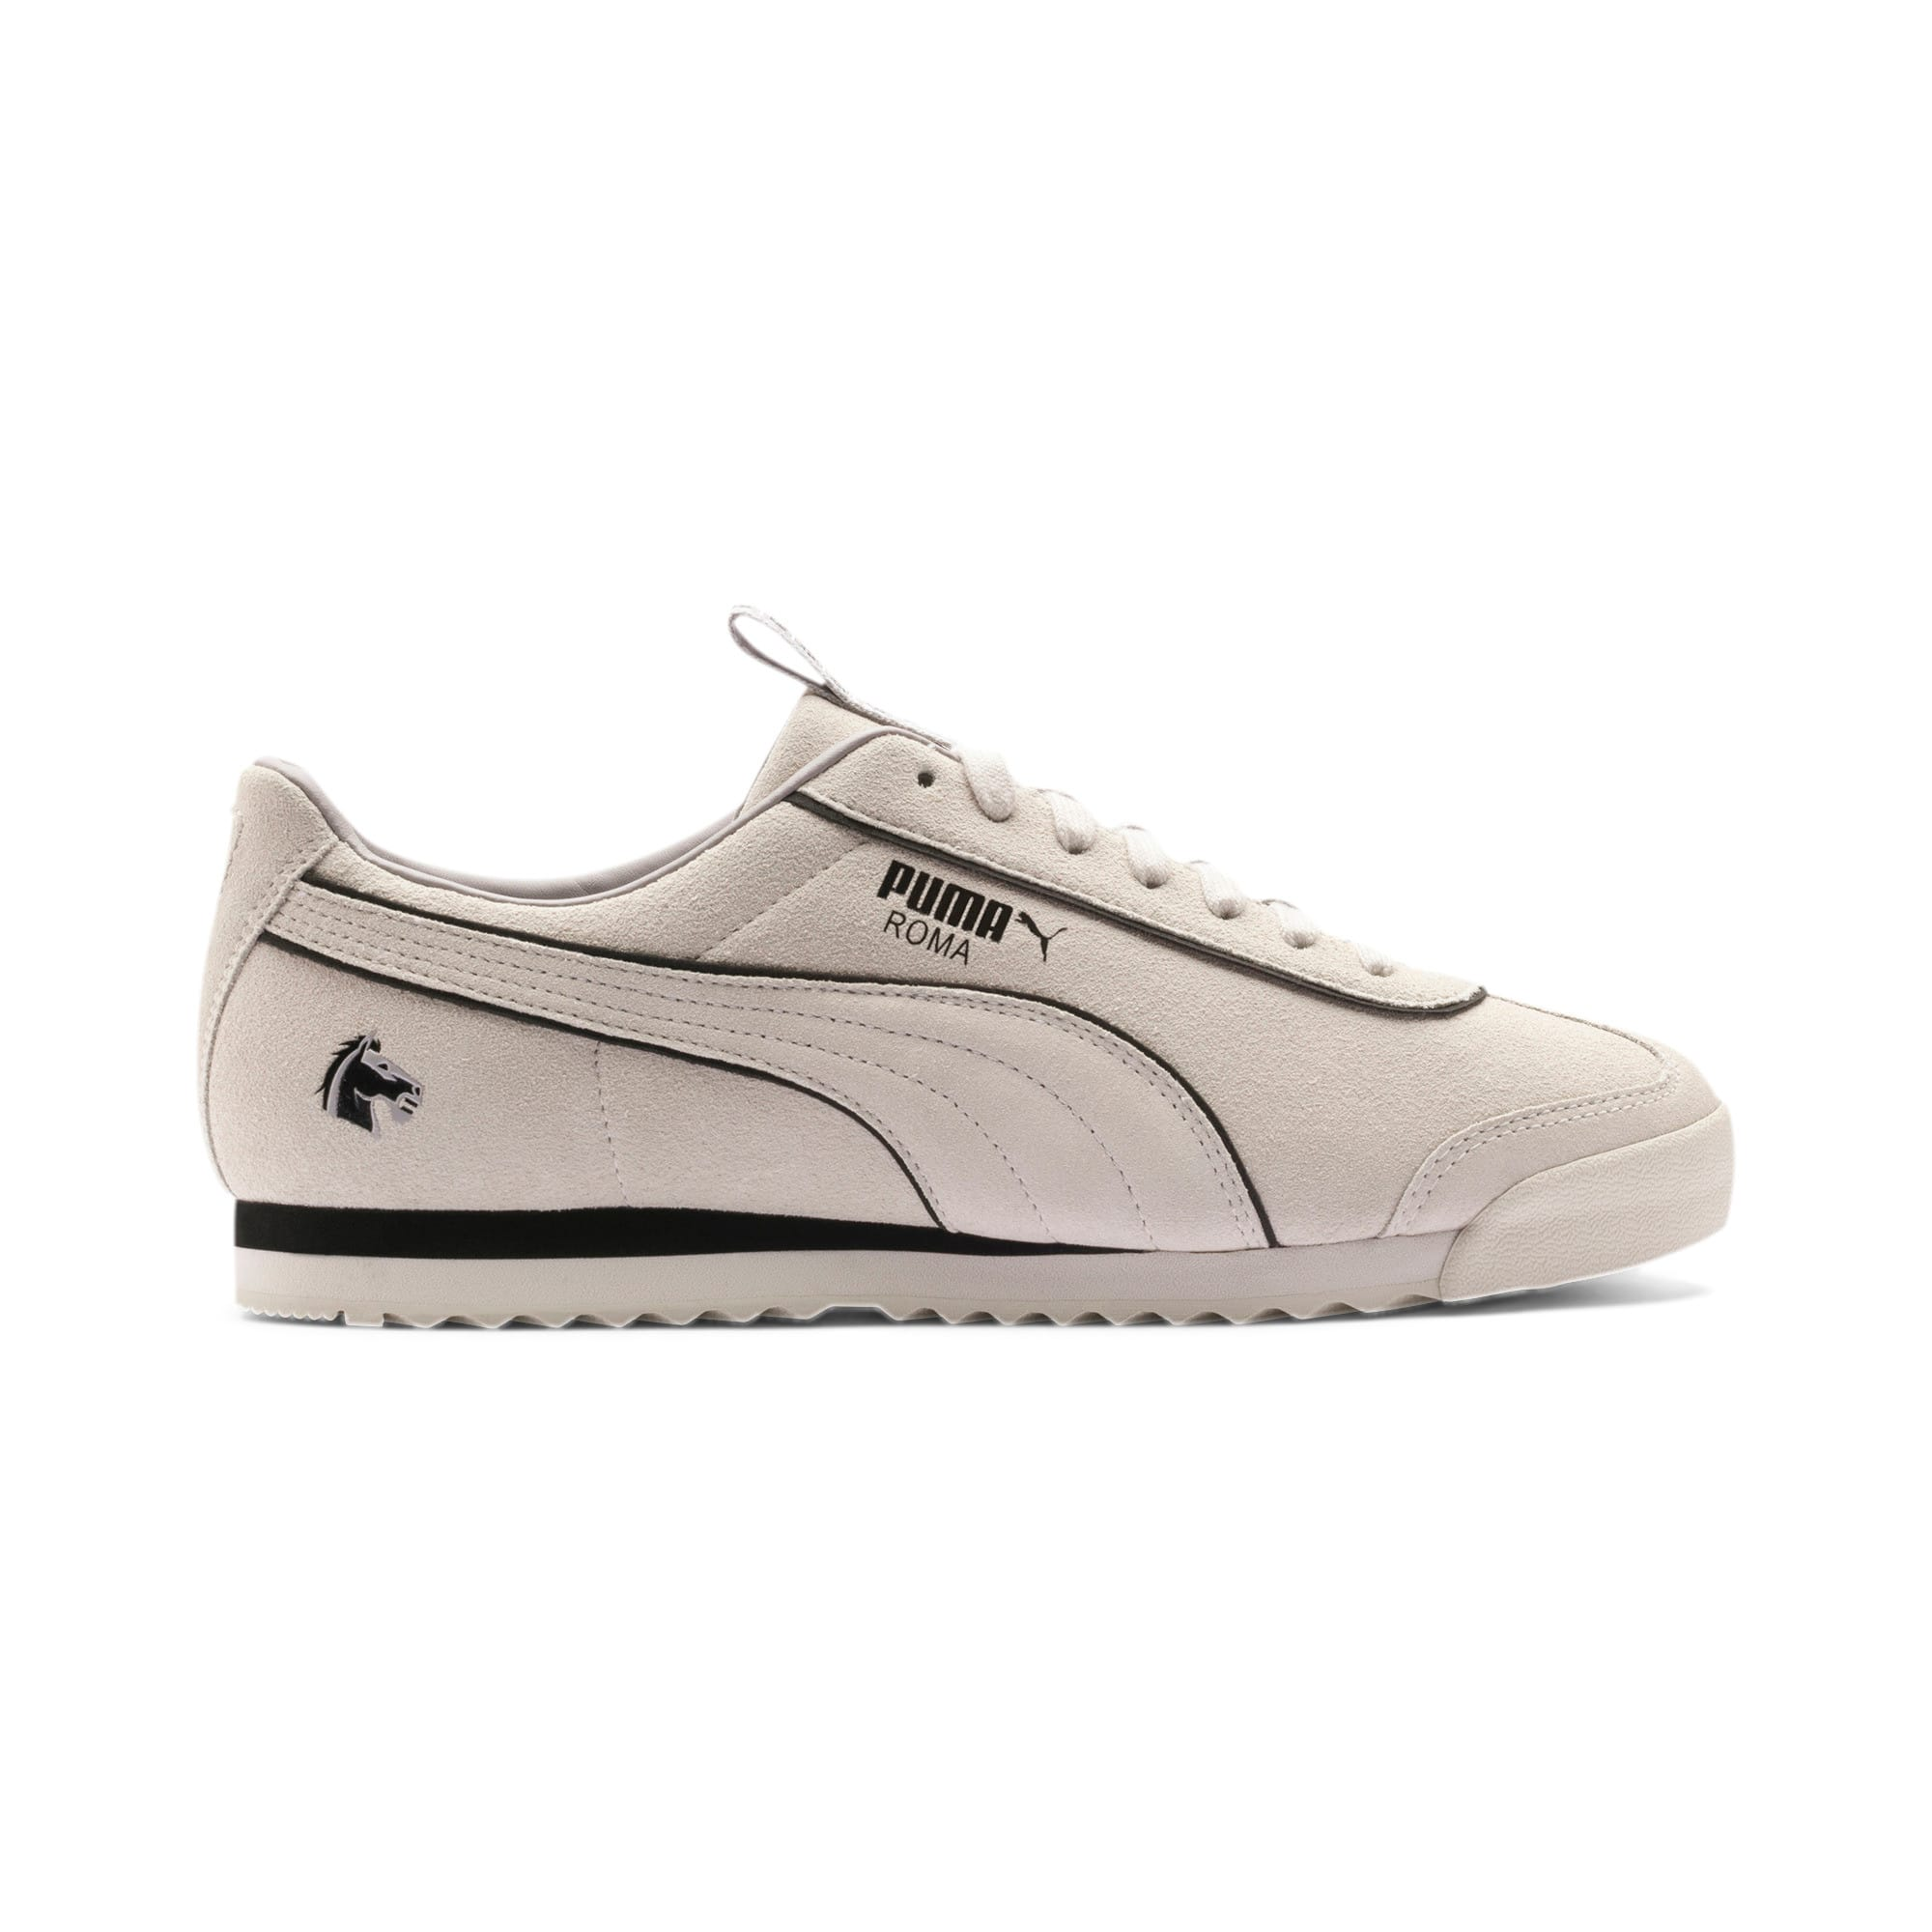 Thumbnail 7 of PUMA x THE GODFATHER Roma Woltz Sneakers, WINDCHIME-Puma Black, medium